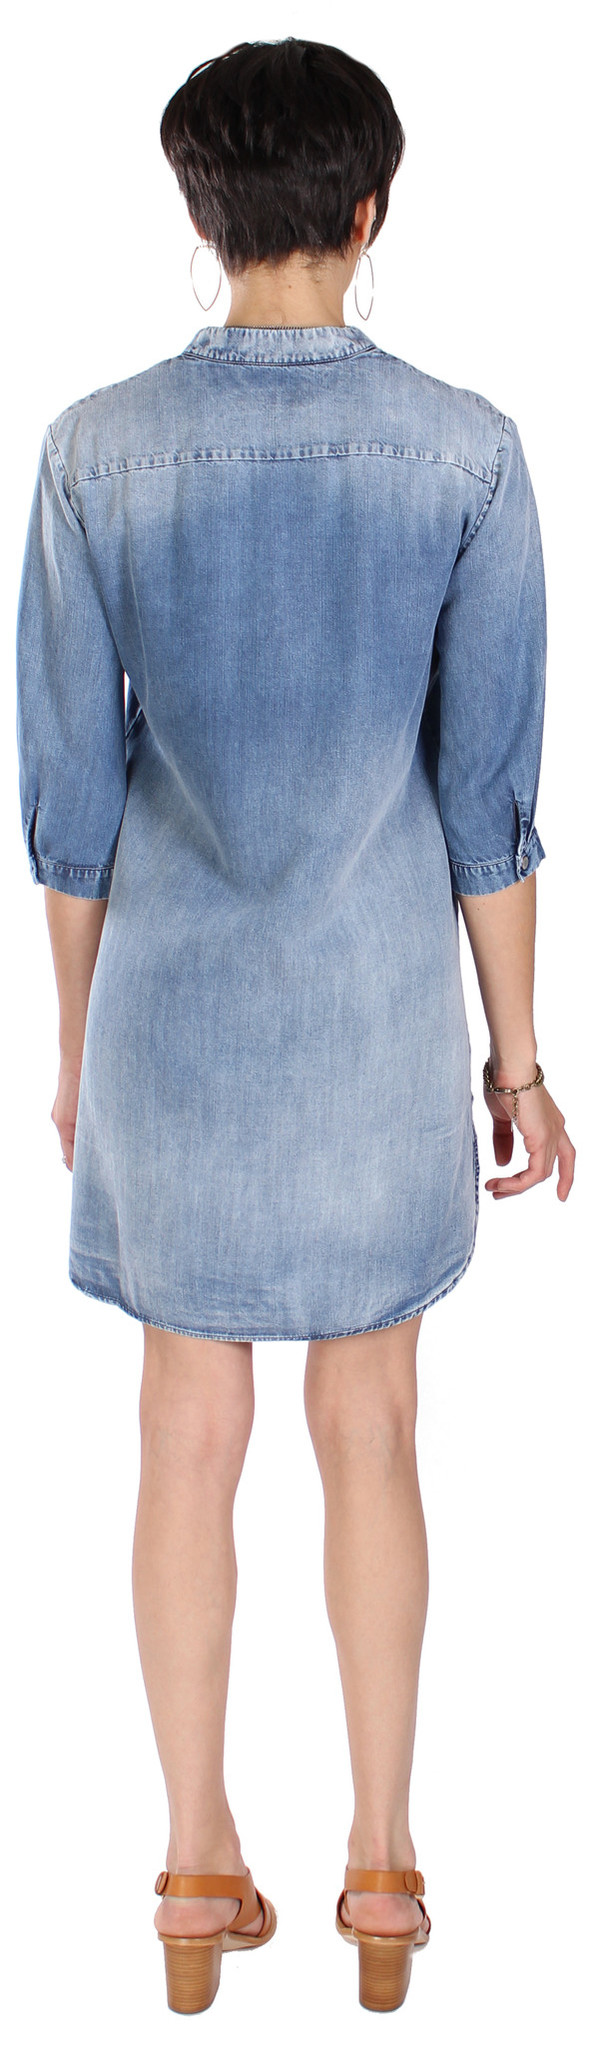 European Culture Denim Shirt Dress